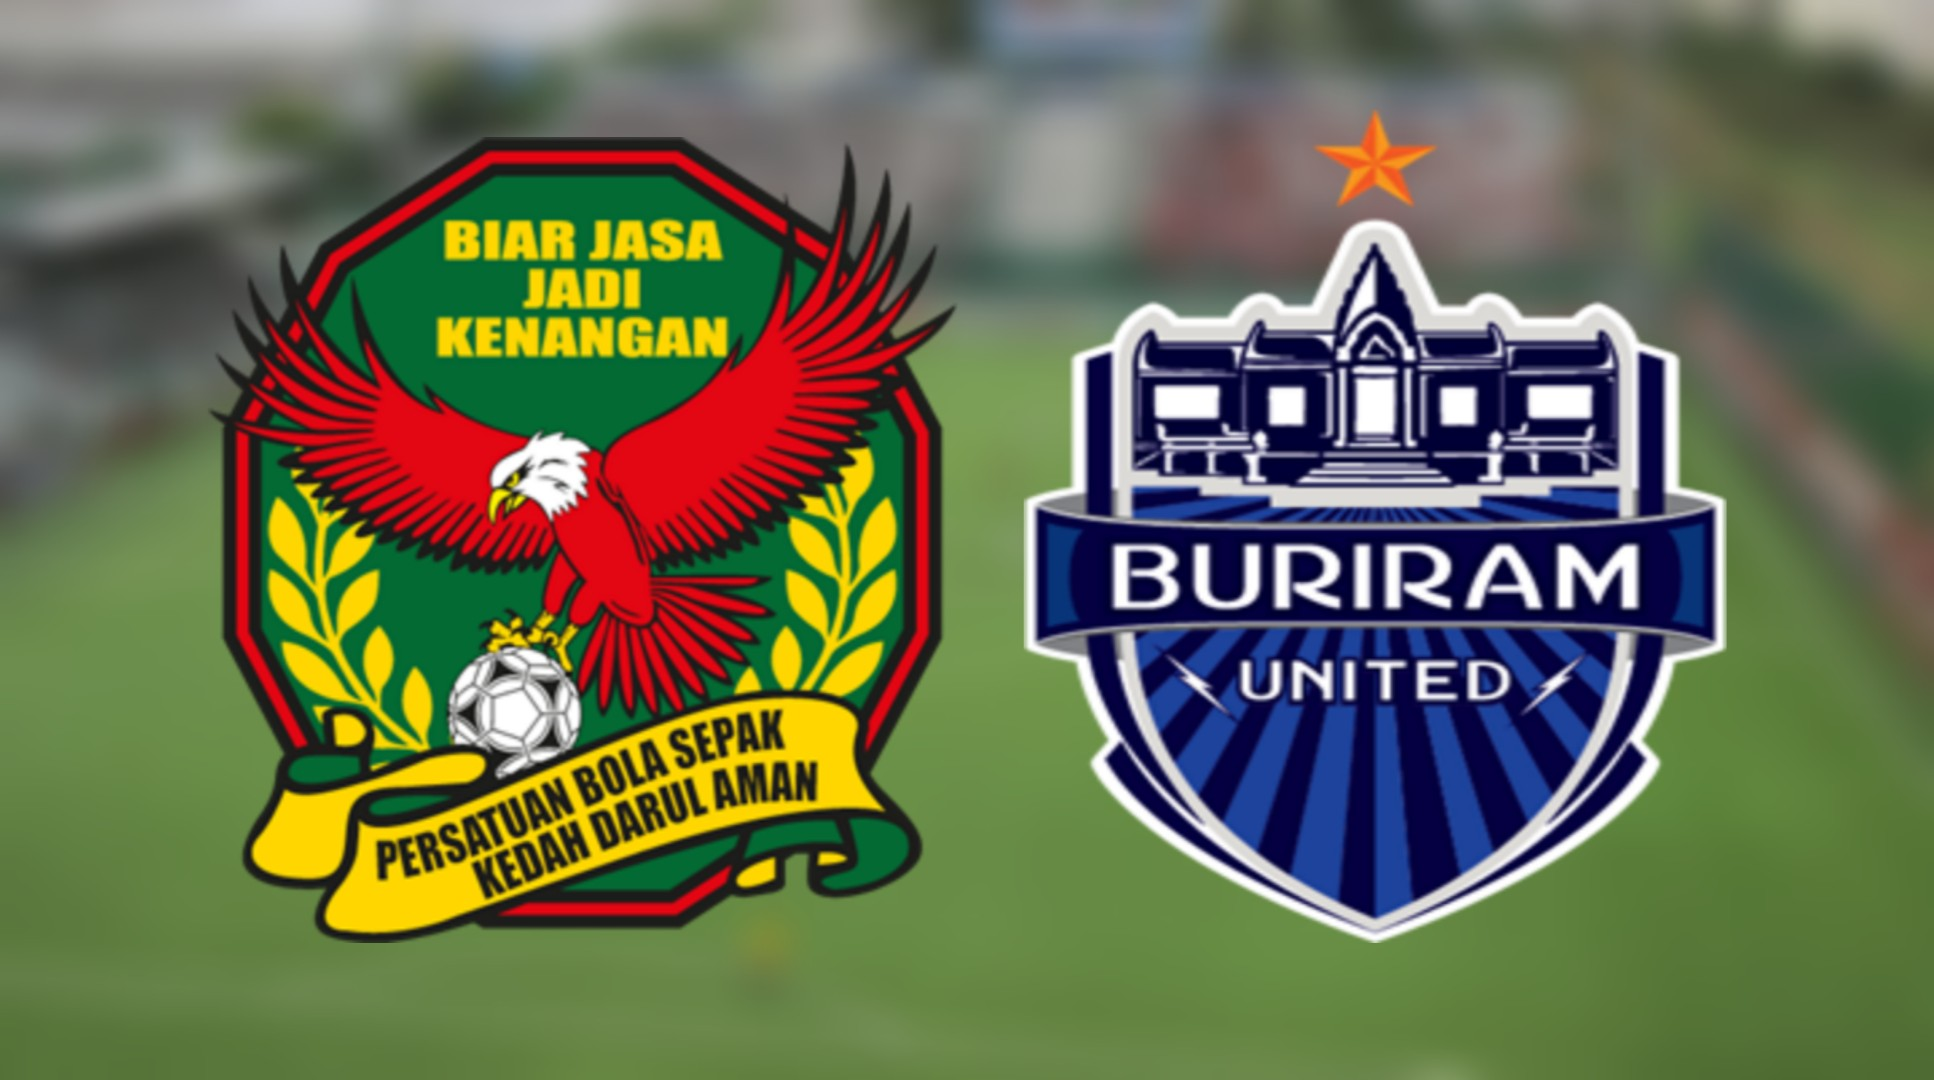 Live Streaming Kedah FA vs Buriram United 19.1.2019 Friendly Match